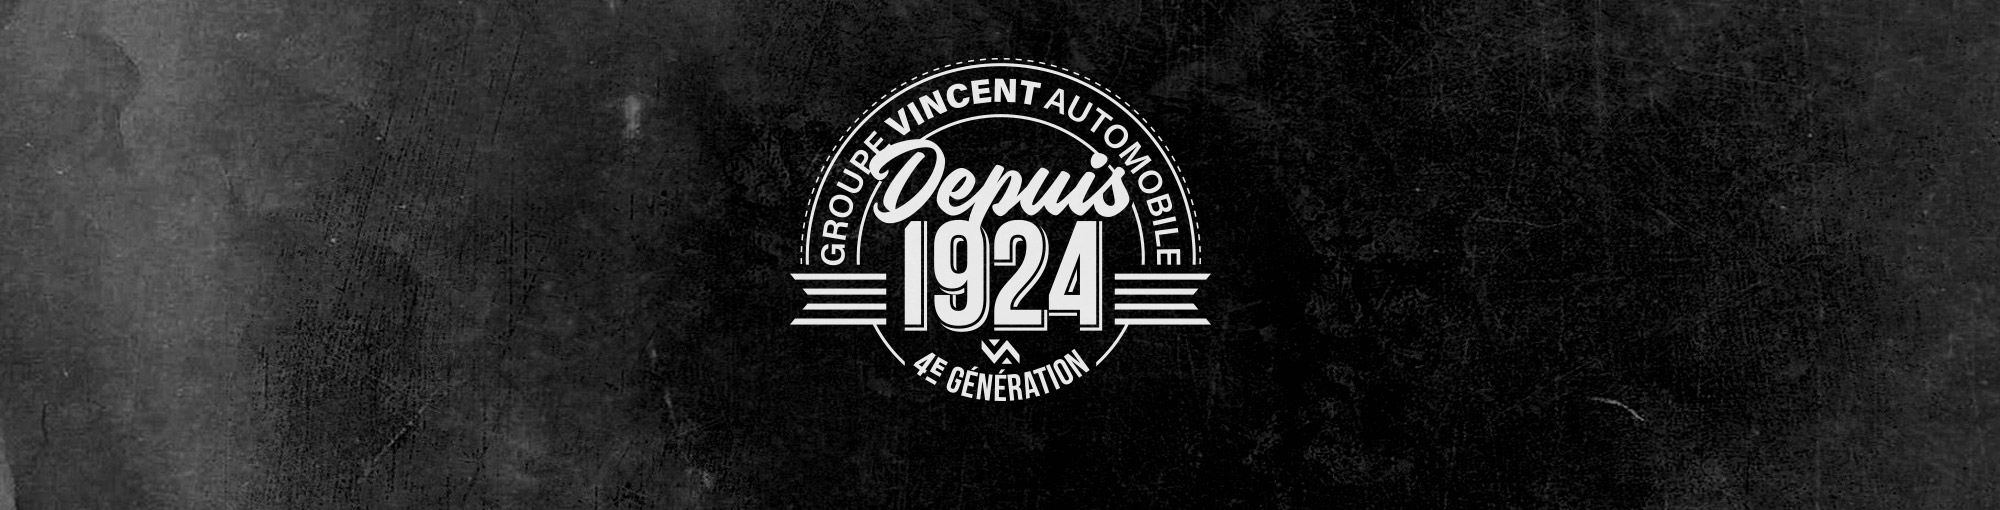 Hyundai Main header 95 ans #2 Depuis 1924